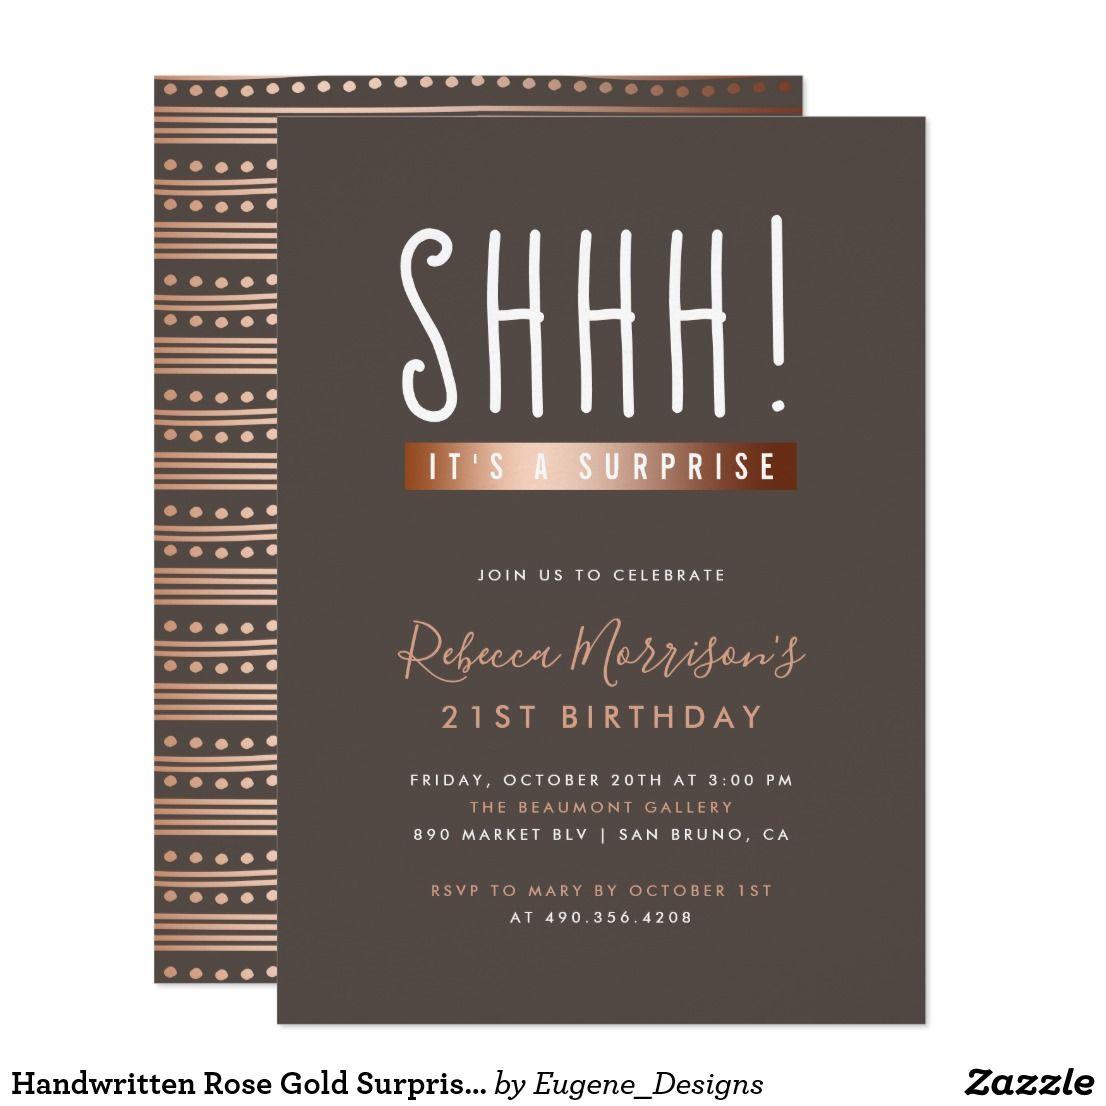 Handwritten Rose Gold Surprise Birthday Party Invitation